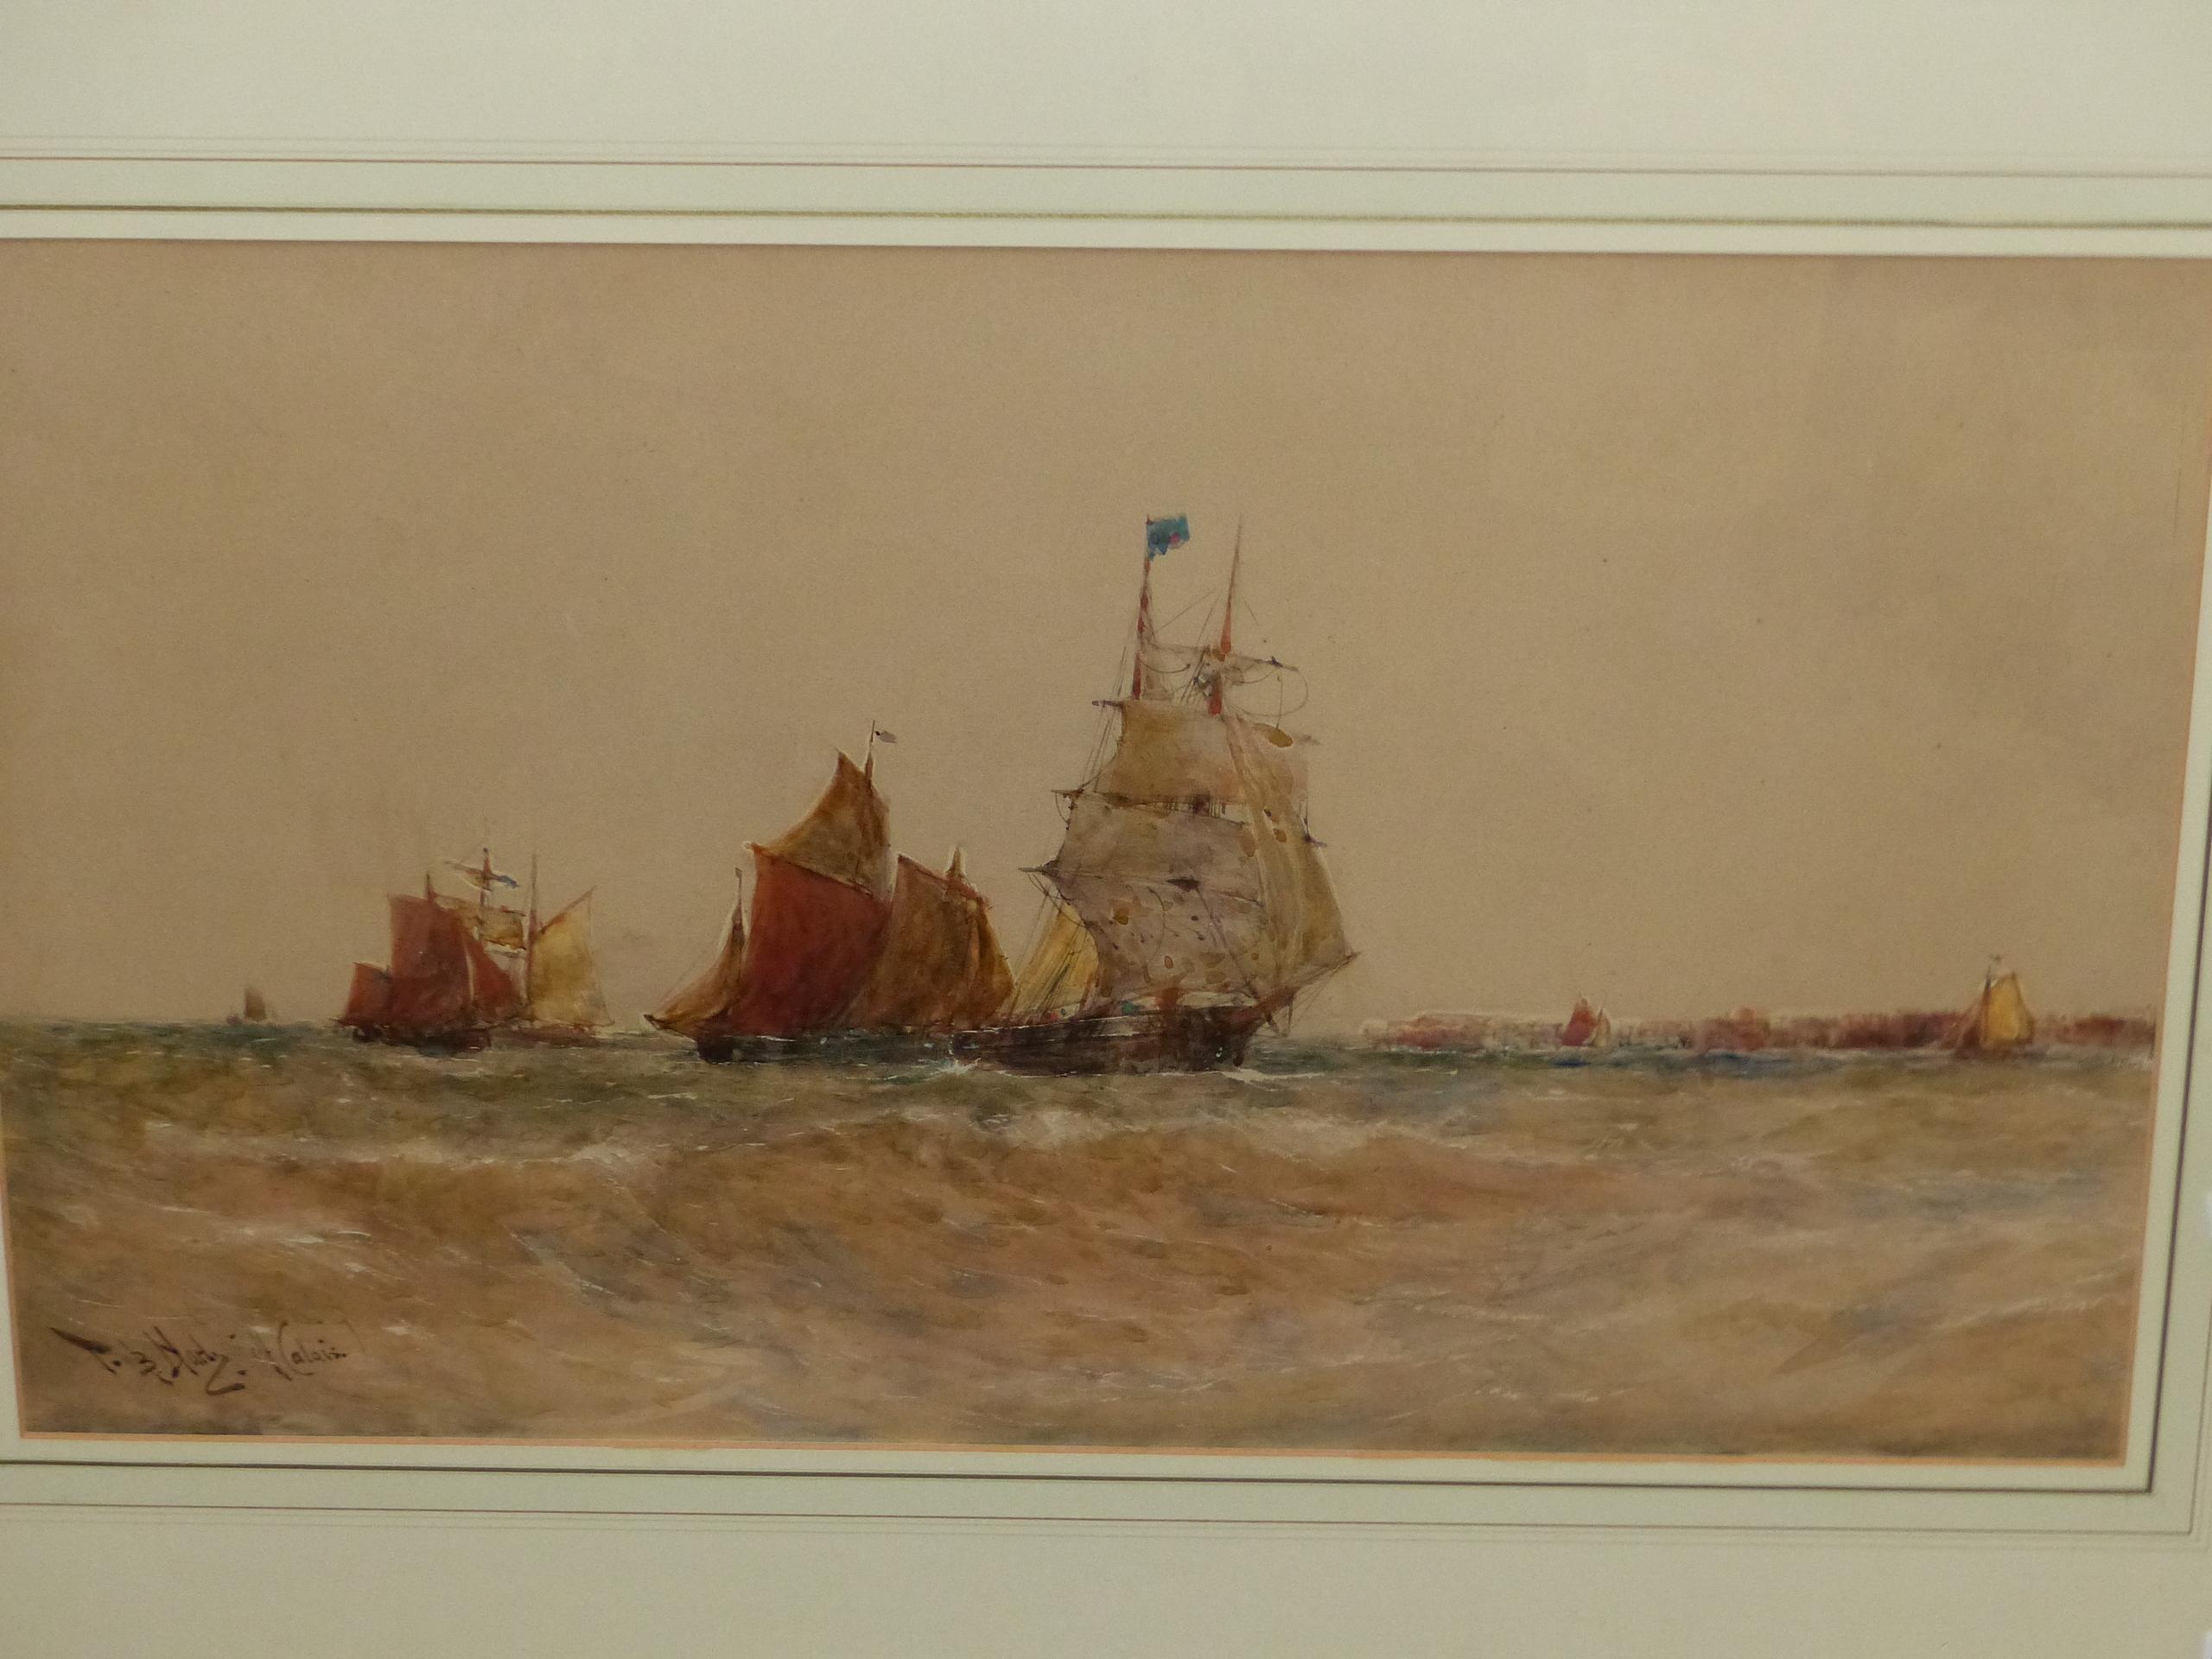 THOMAS BUSH HARDY (1842 - 1897). SHIPPING OFF CALAIS, SIGNED WATERCOLOUR, 40 x 68cms. - Image 5 of 6